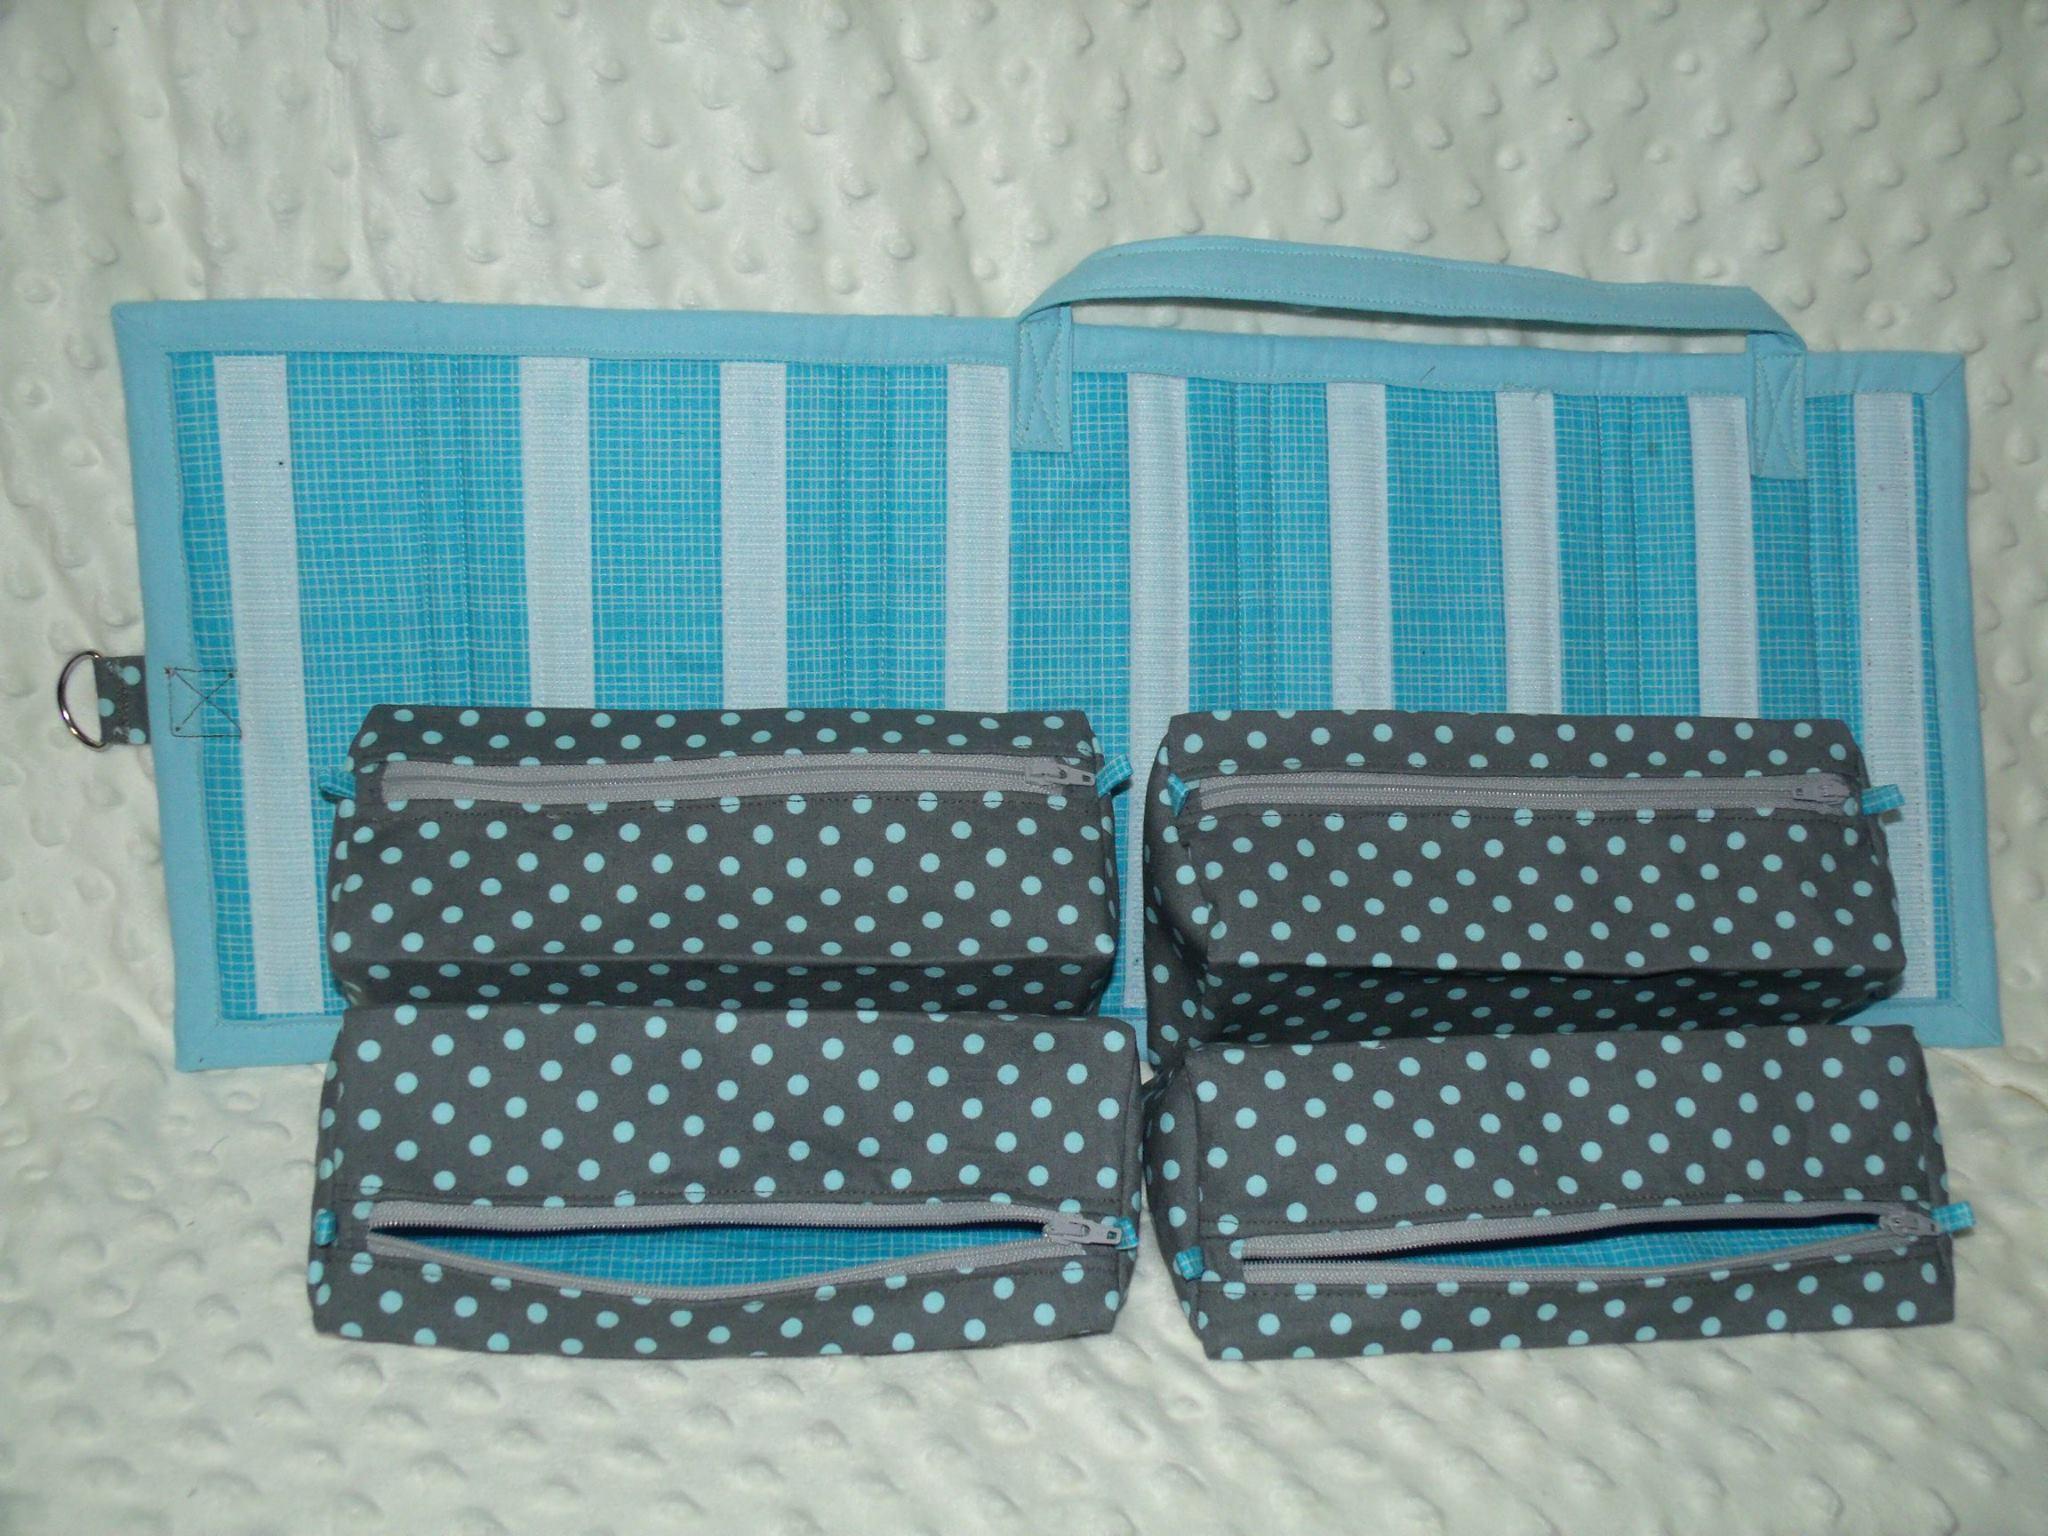 Sewing Organiser Pattern Gallery Craft Decoration Ideas